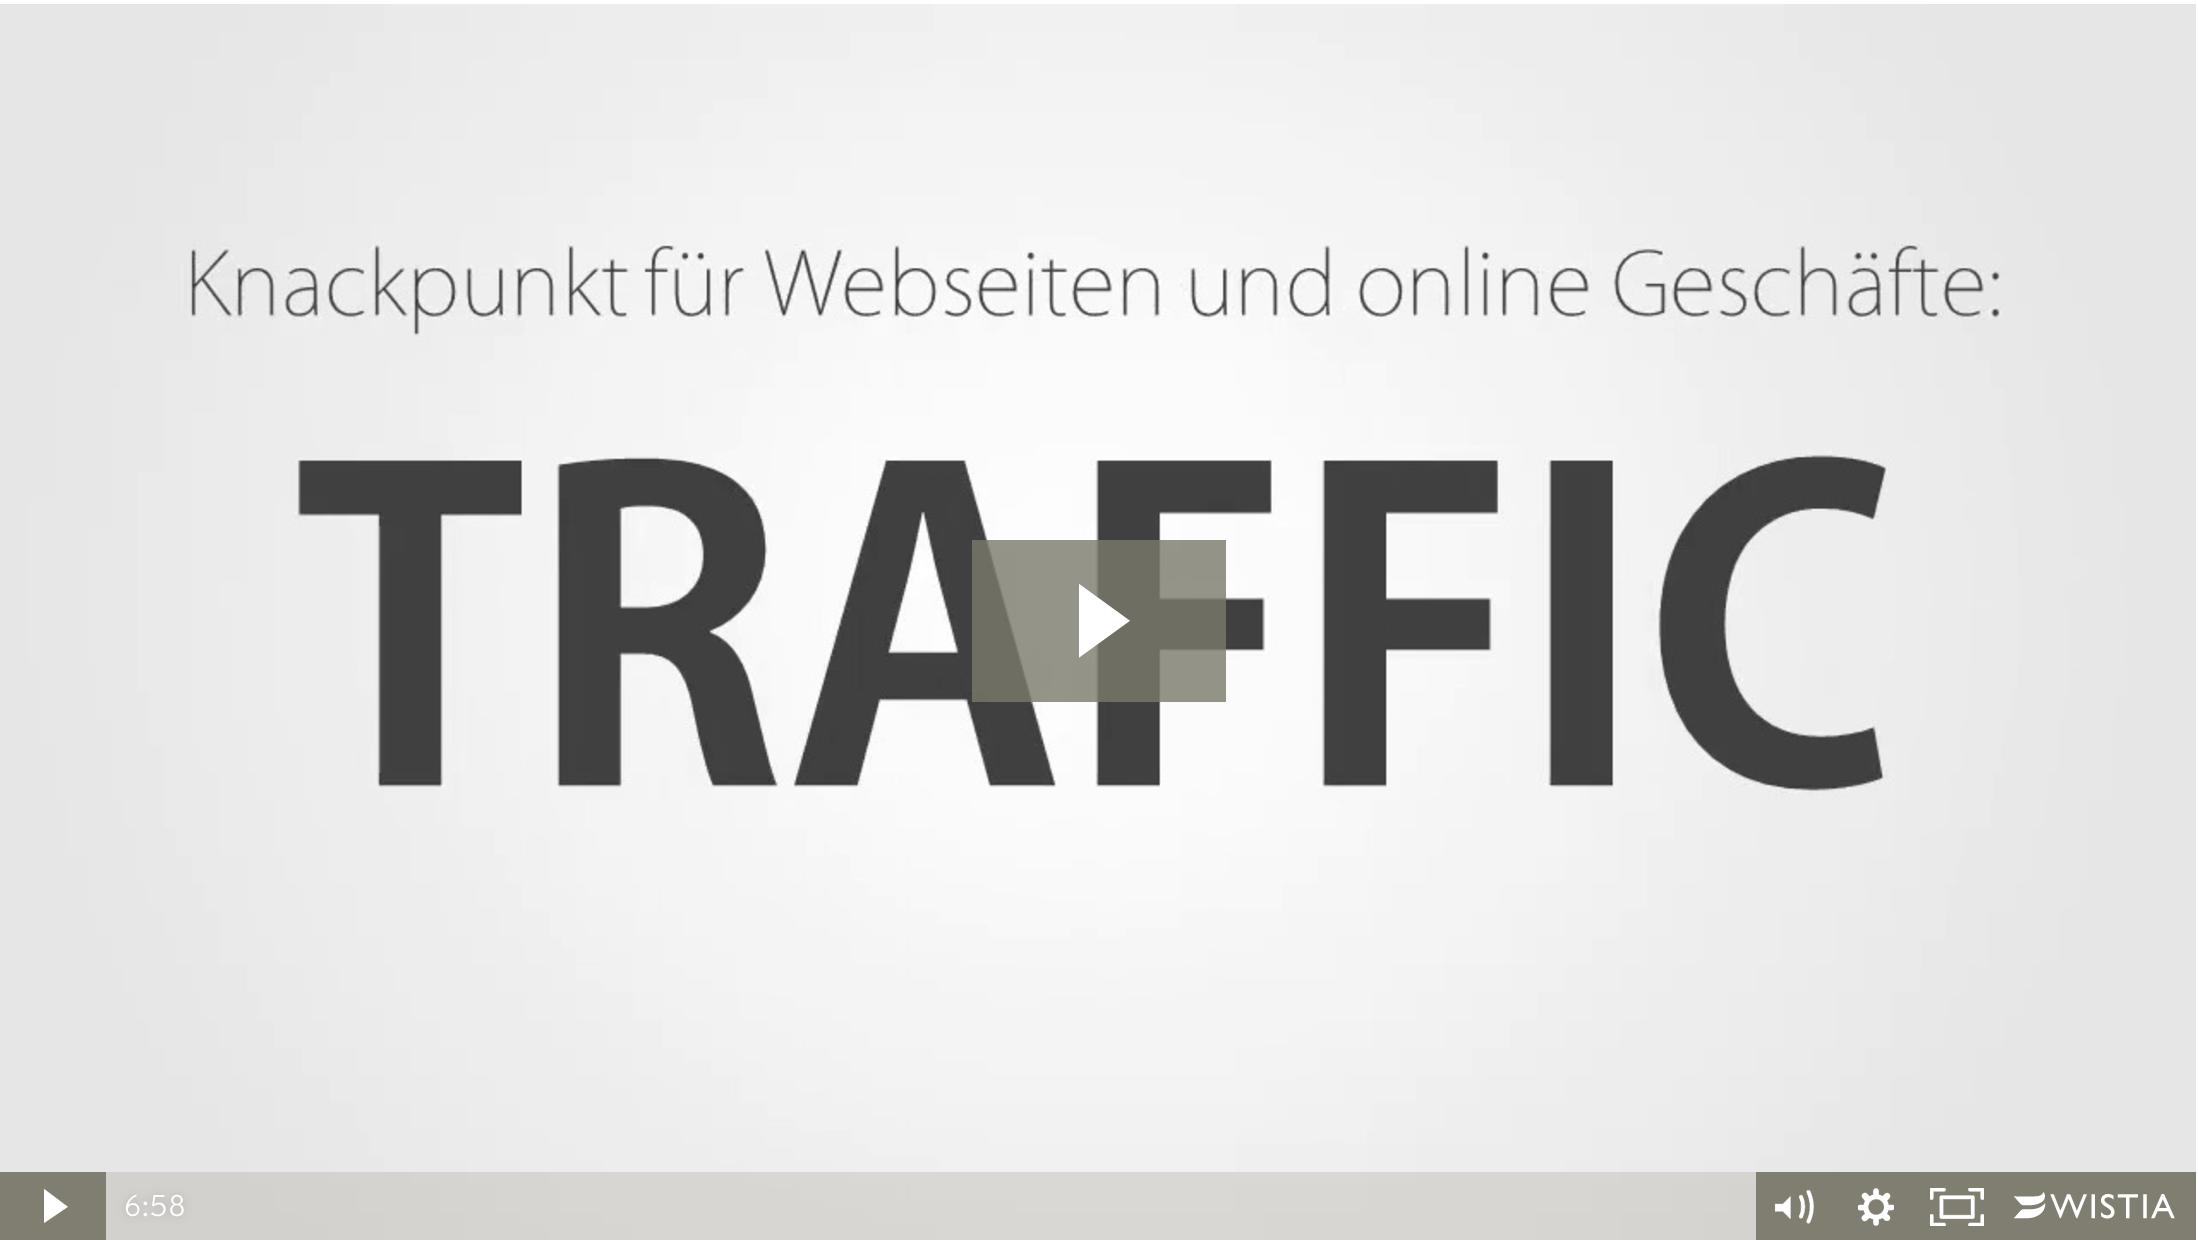 TrafficStrategie.png